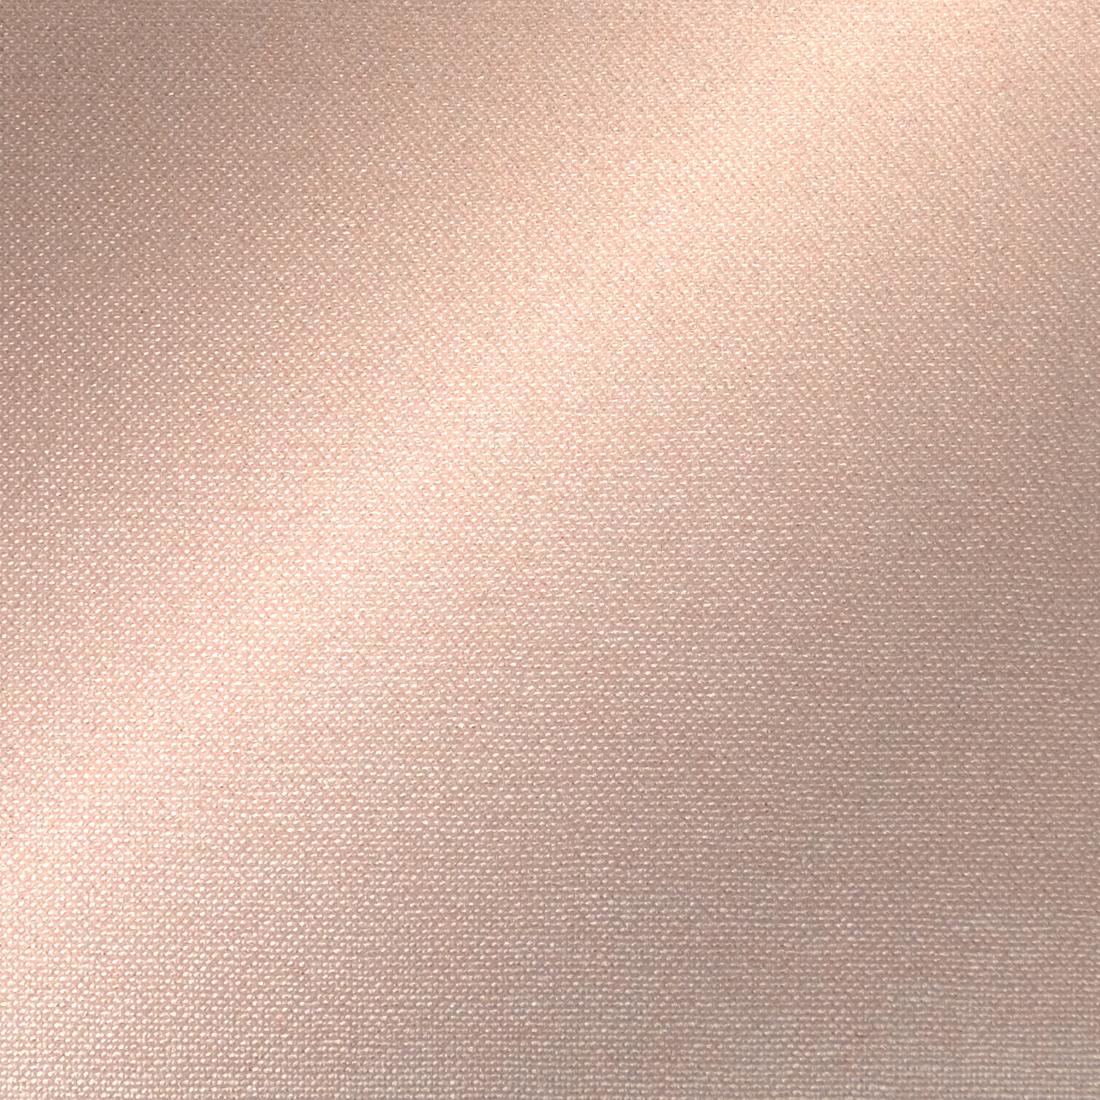 060_031C_KupferHell